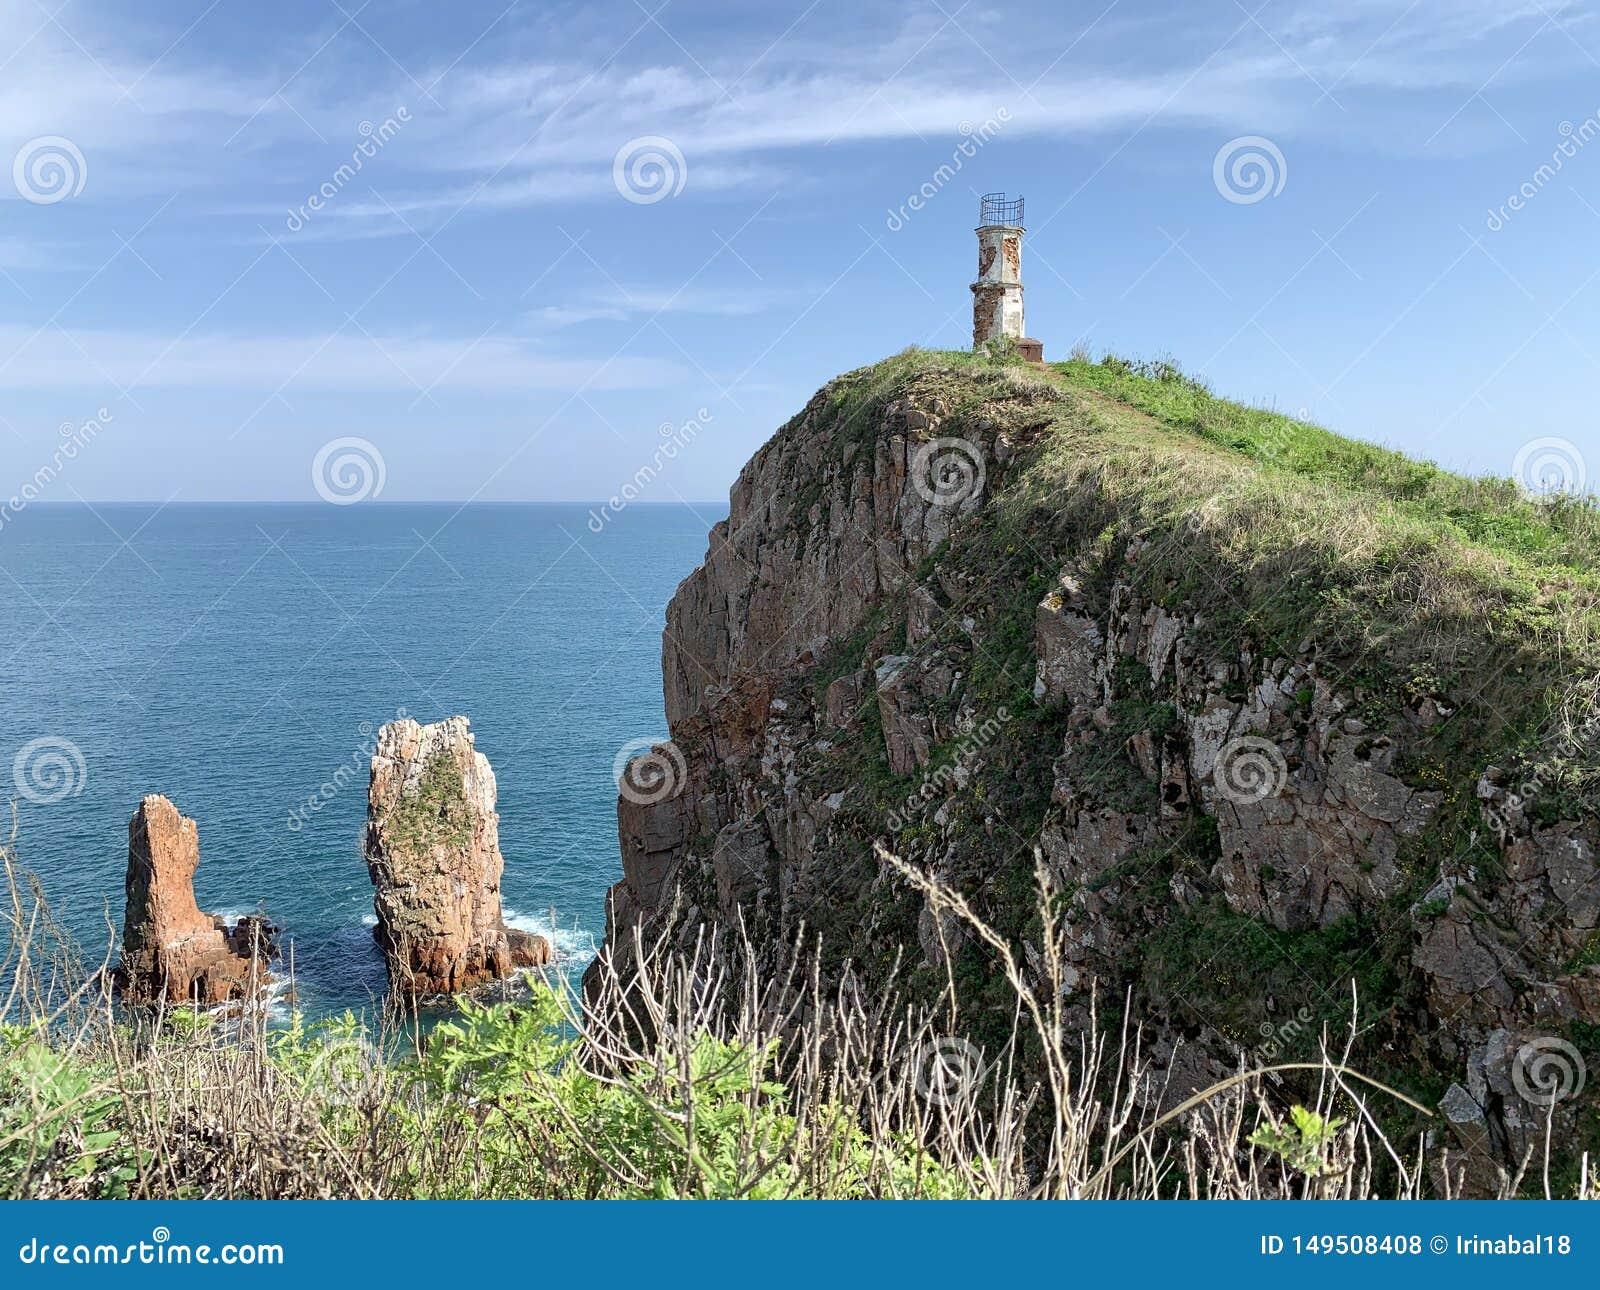 Russia, Vladivostok, Island of Shkot. Cape  of lighthouse